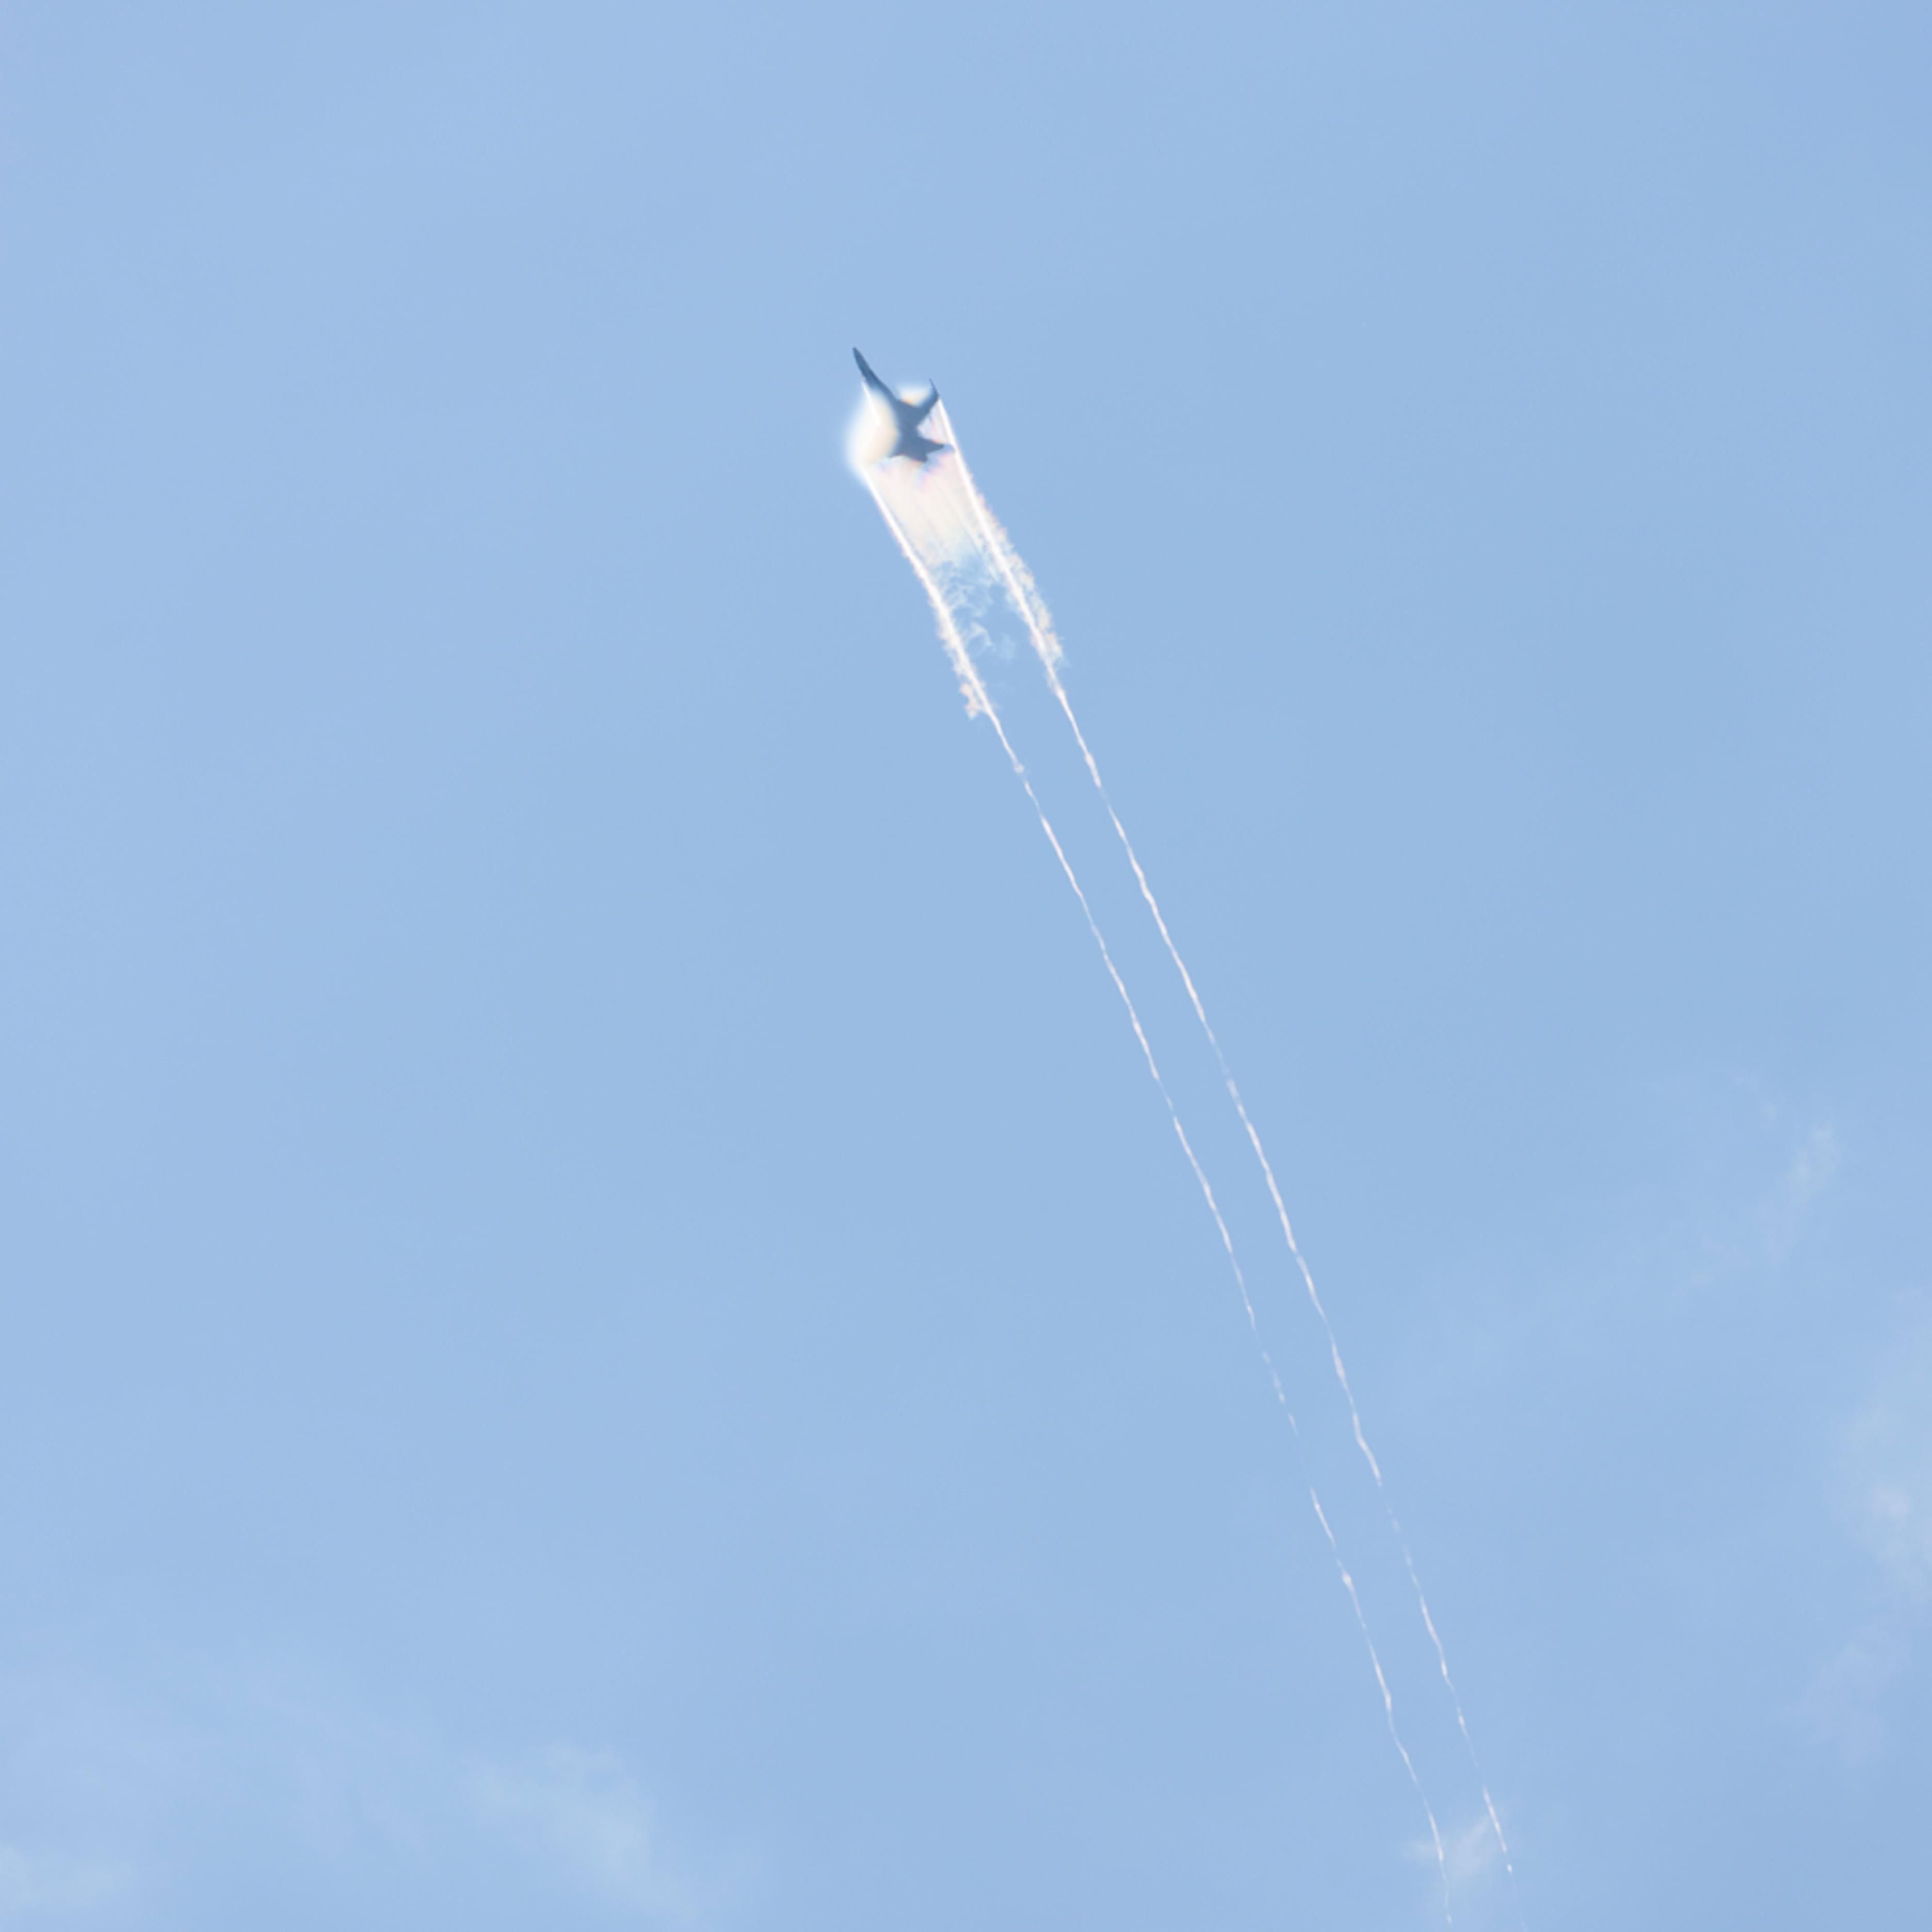 F18 condensation cloud 10722 hpjtey